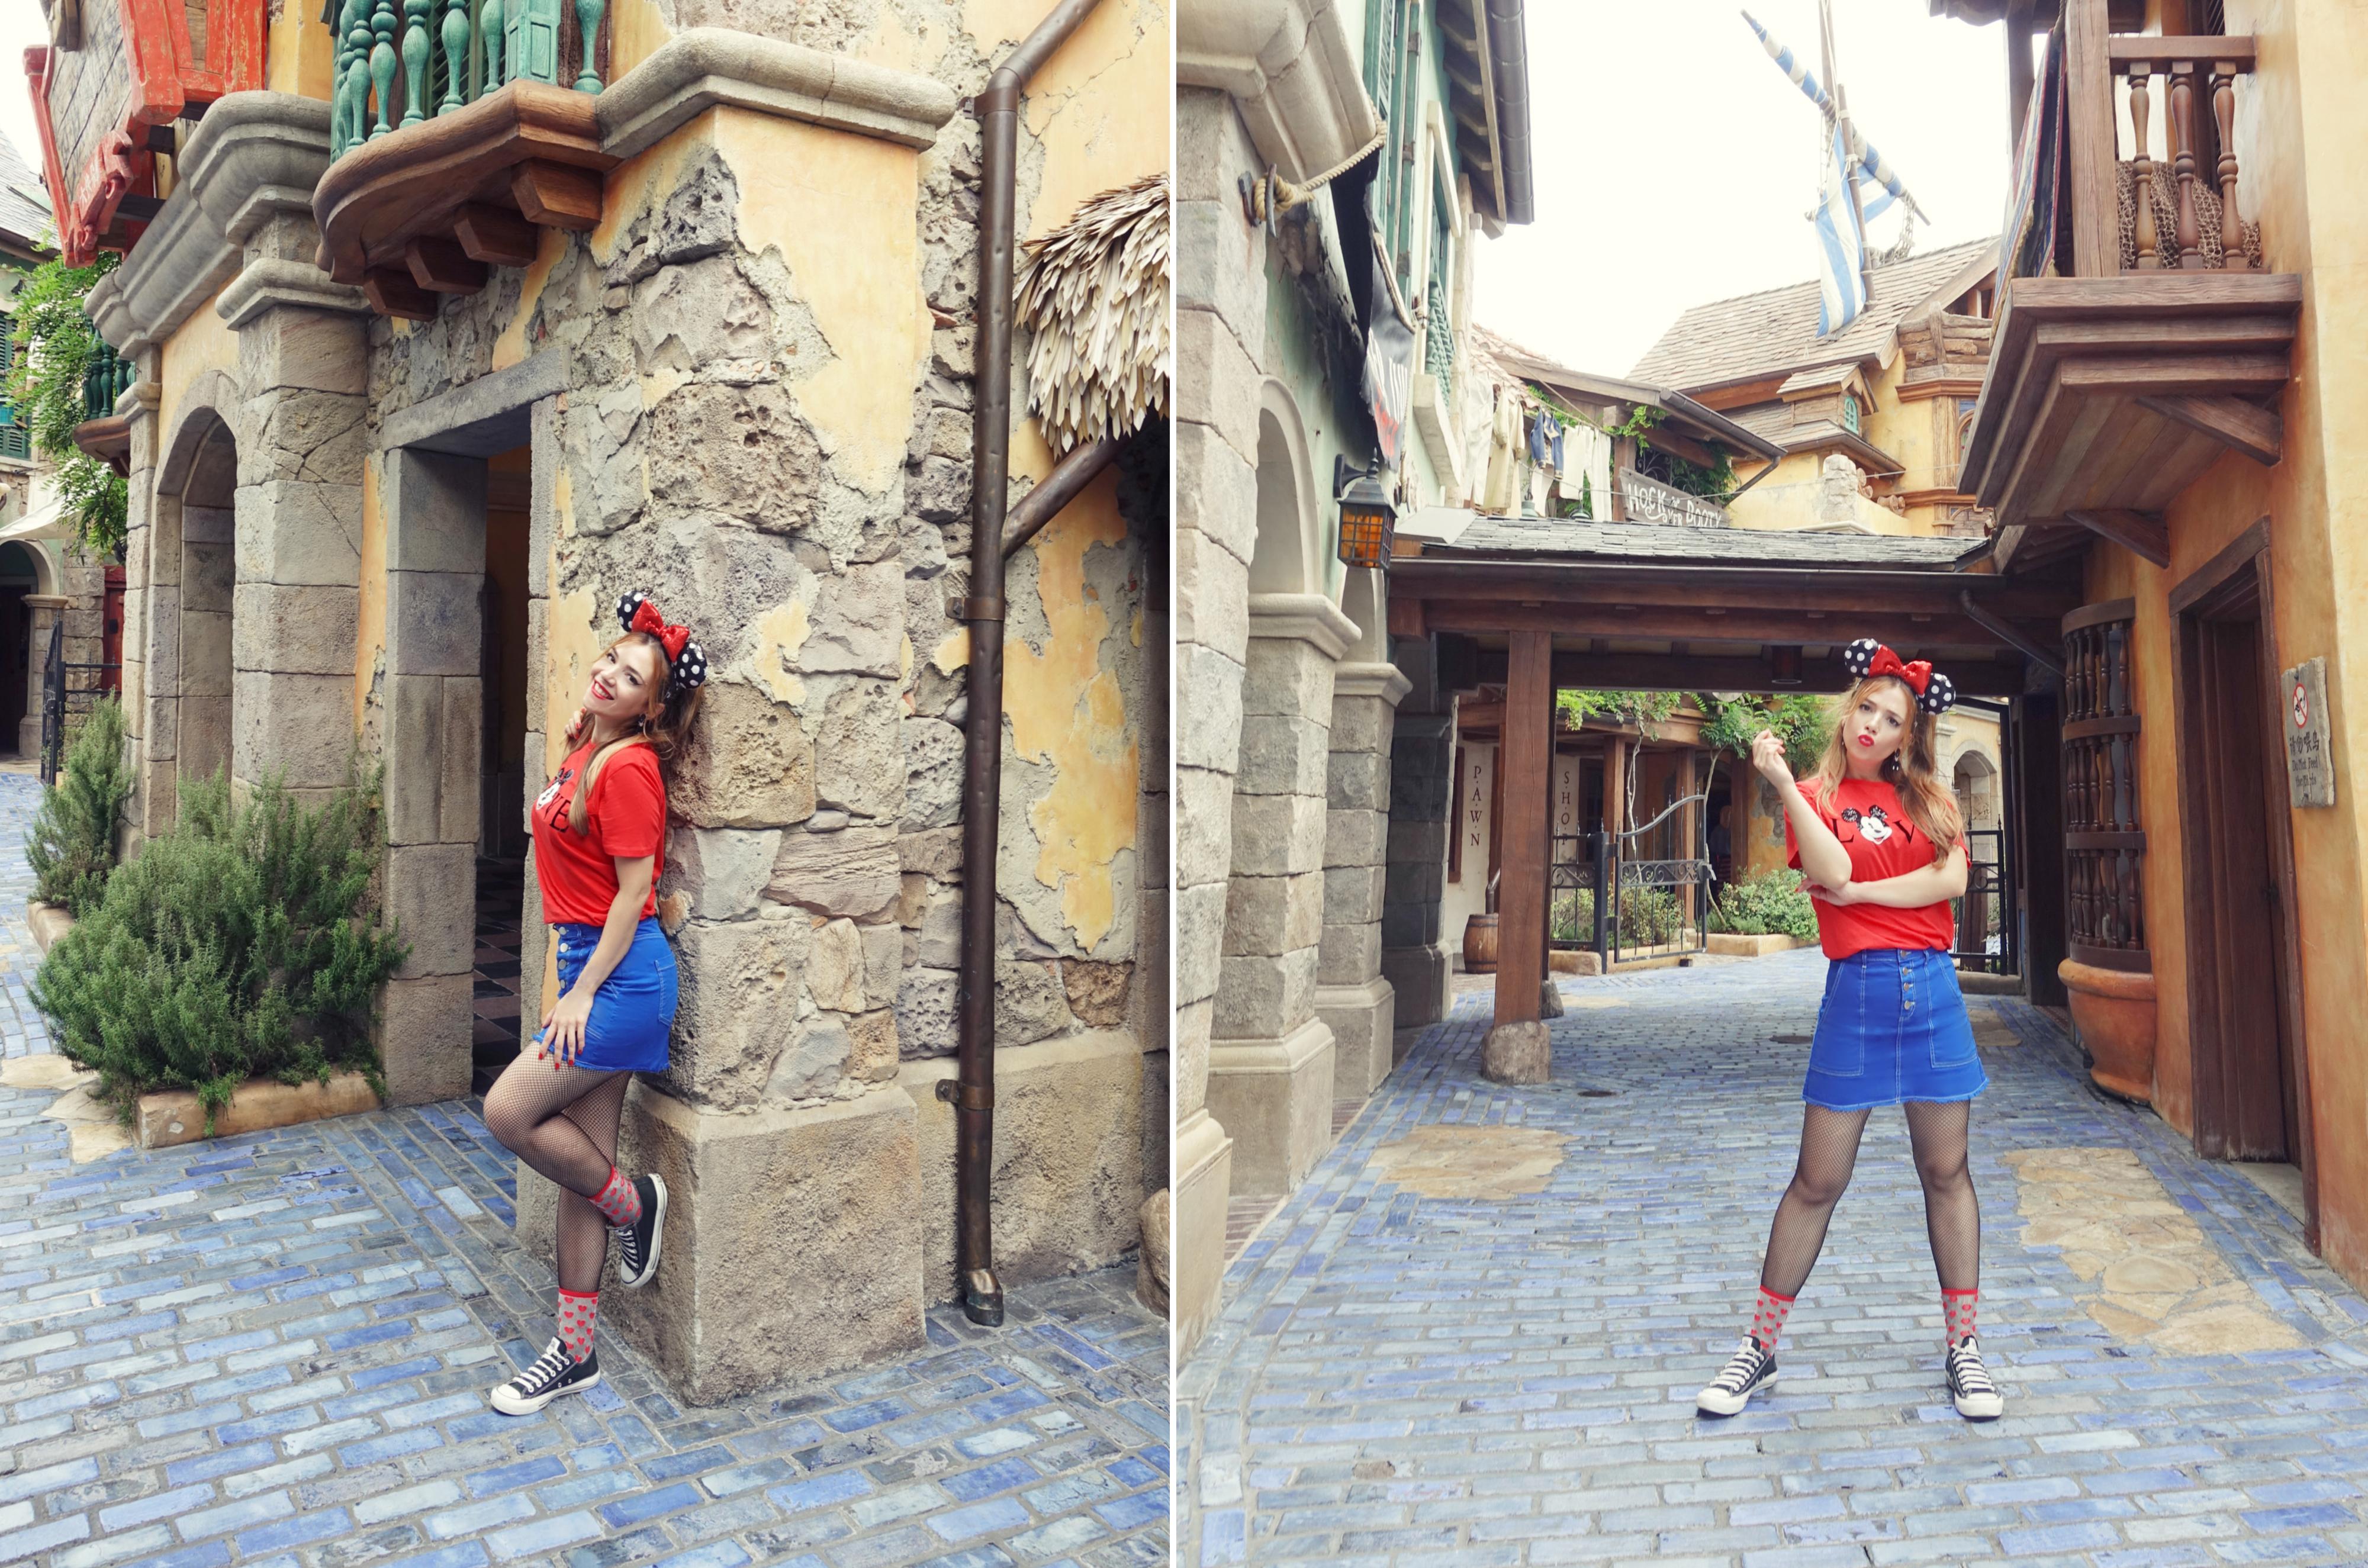 Disney-look-guideline-PiensaenChic-blog-de-moda-Chic-adicta-fashionista-influencer-disneyland-shanghai-Piratas-del-caribe-china-atraccion-Chicadicta-Piensa-en-Chic